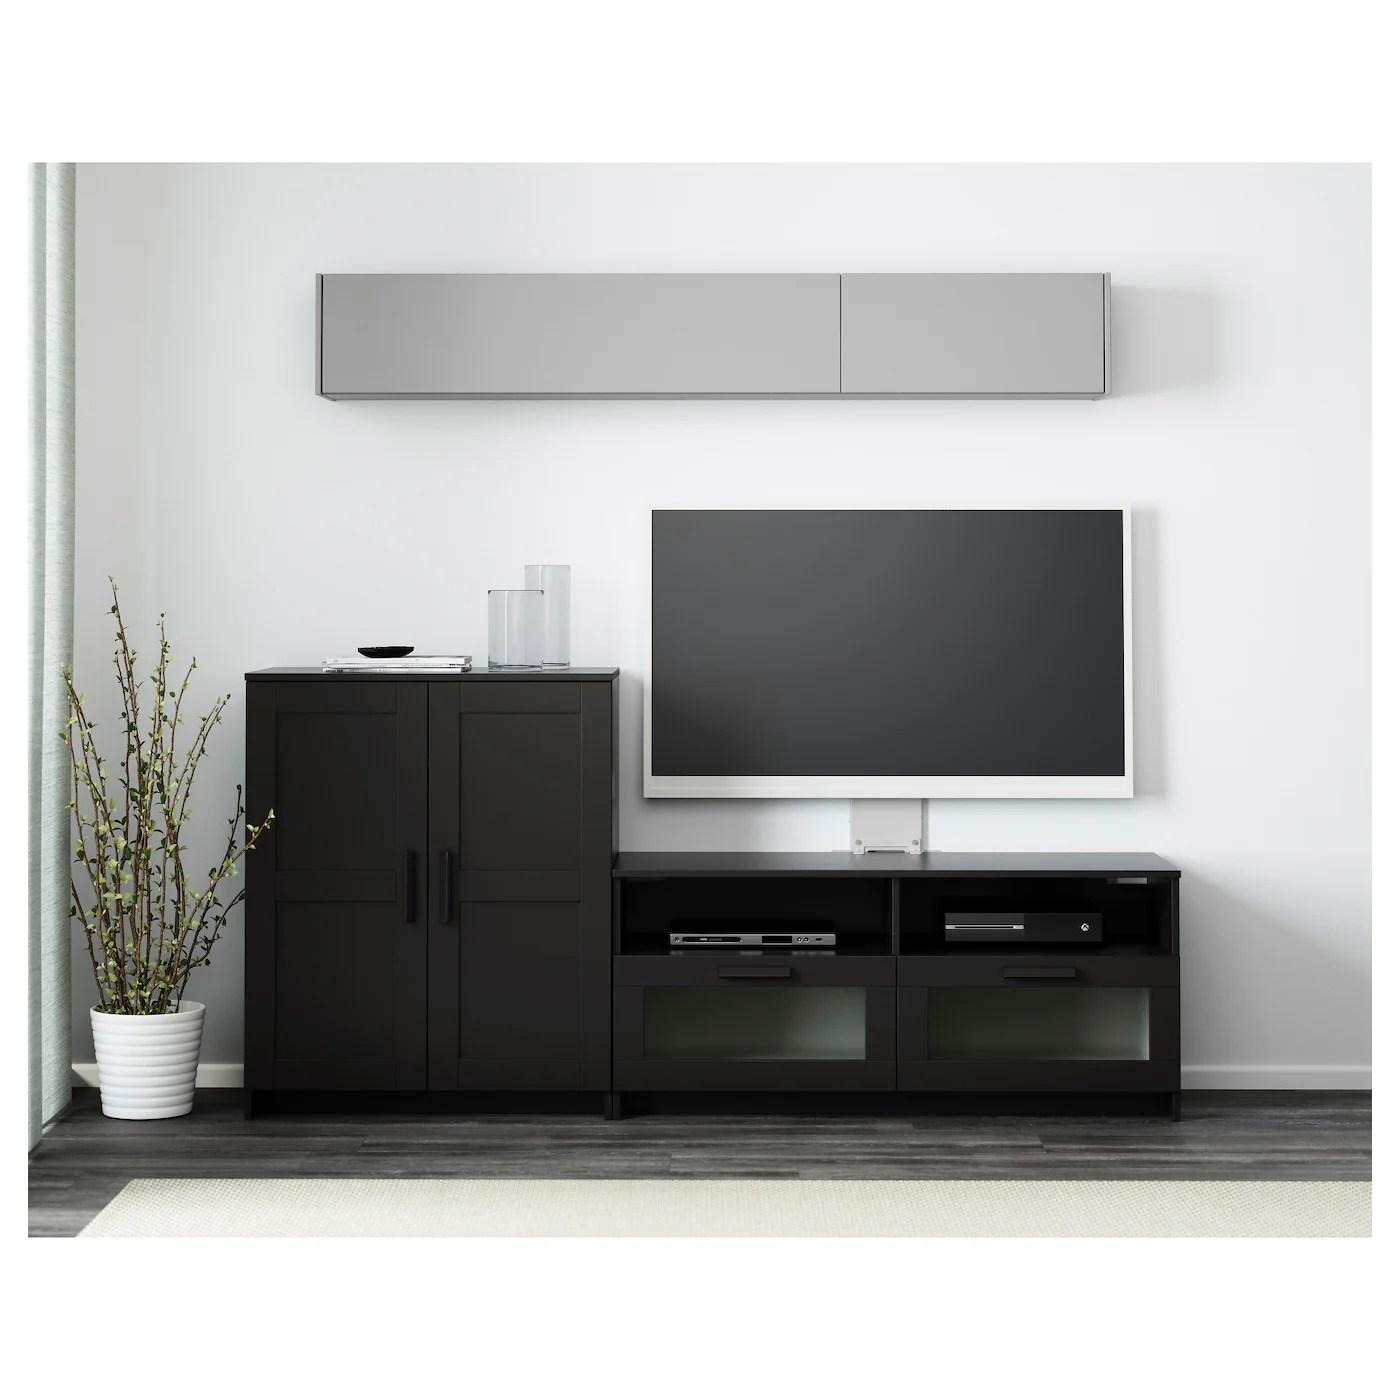 tv chair ikea windsor rocking plans brimnes storage combination black 200 x 41 95 cm